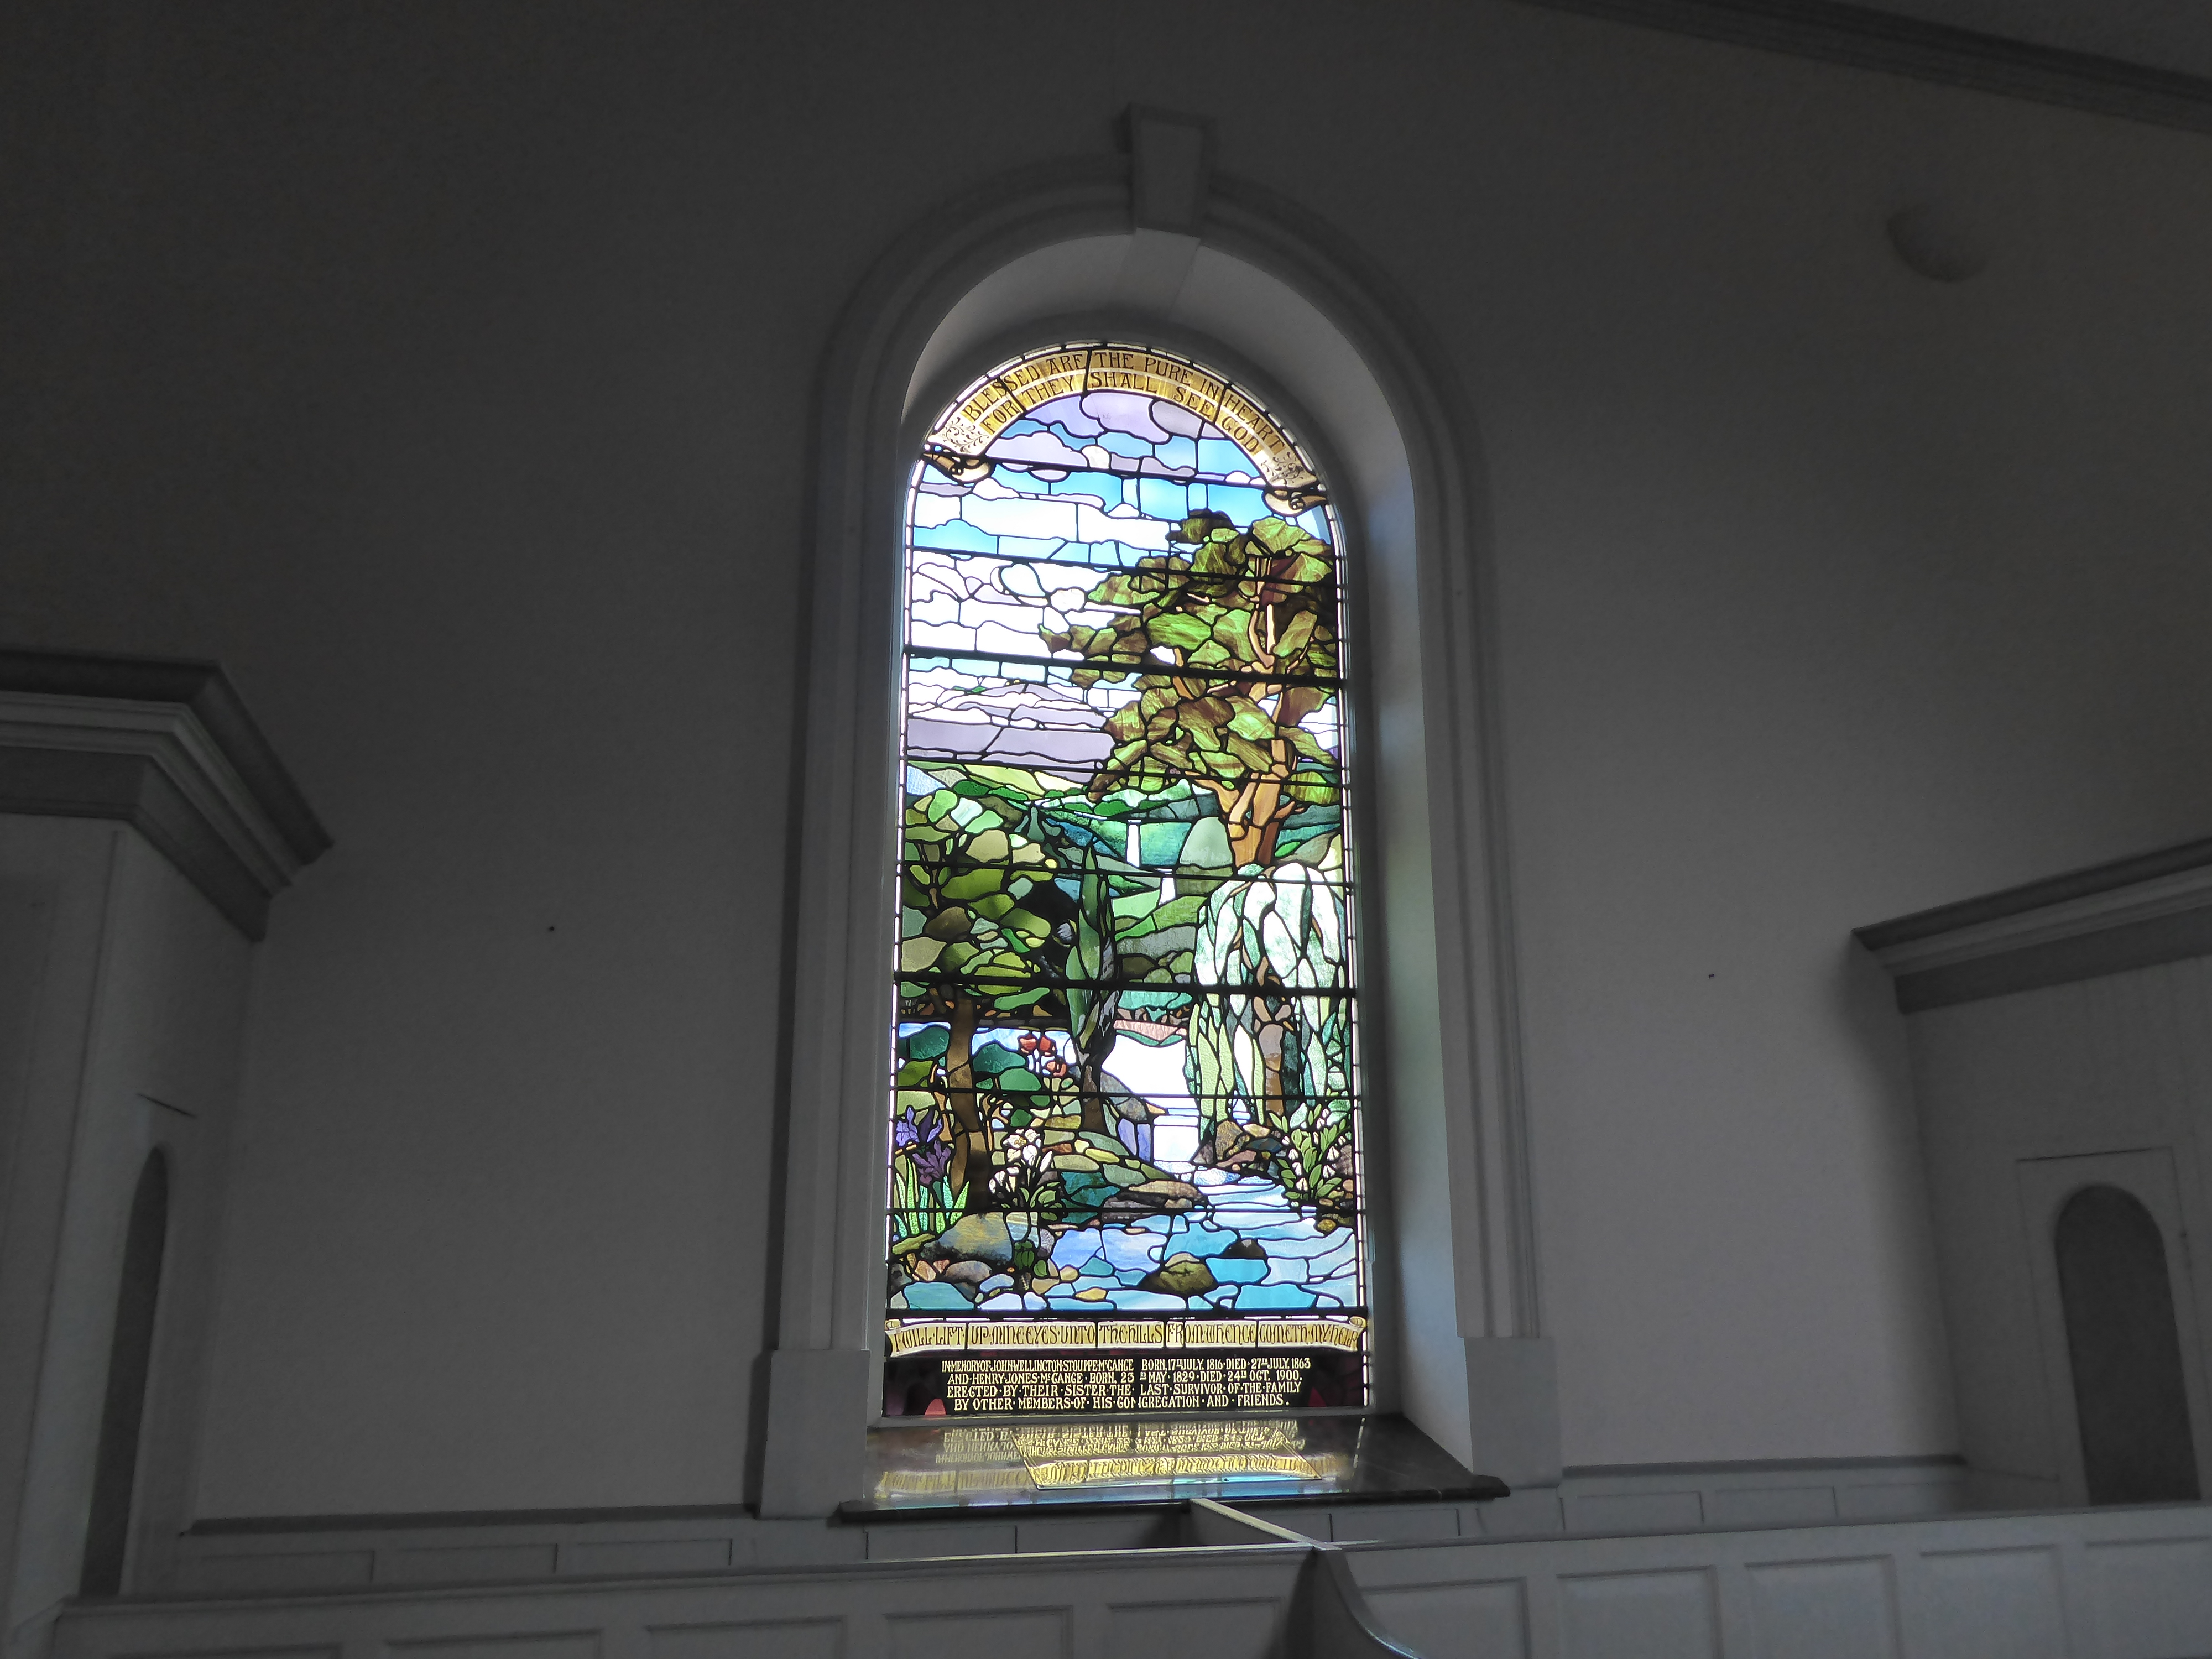 Dunmurry window